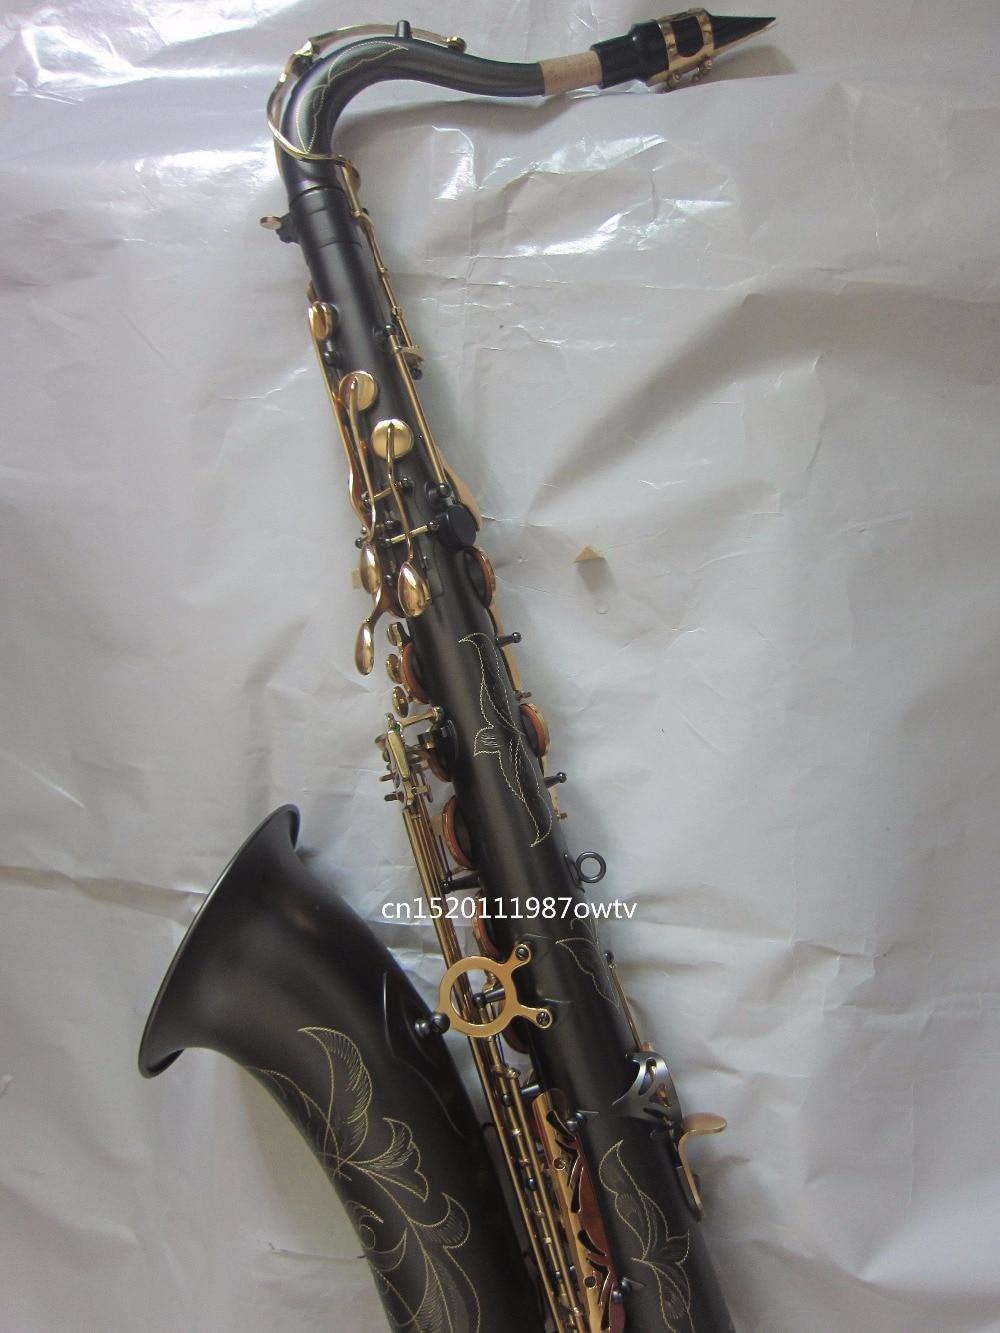 Alta Calidad Saxofón Saxo Libre Tenor Real Fotos Exqwgtws Viento Envío l13TKc5FJu